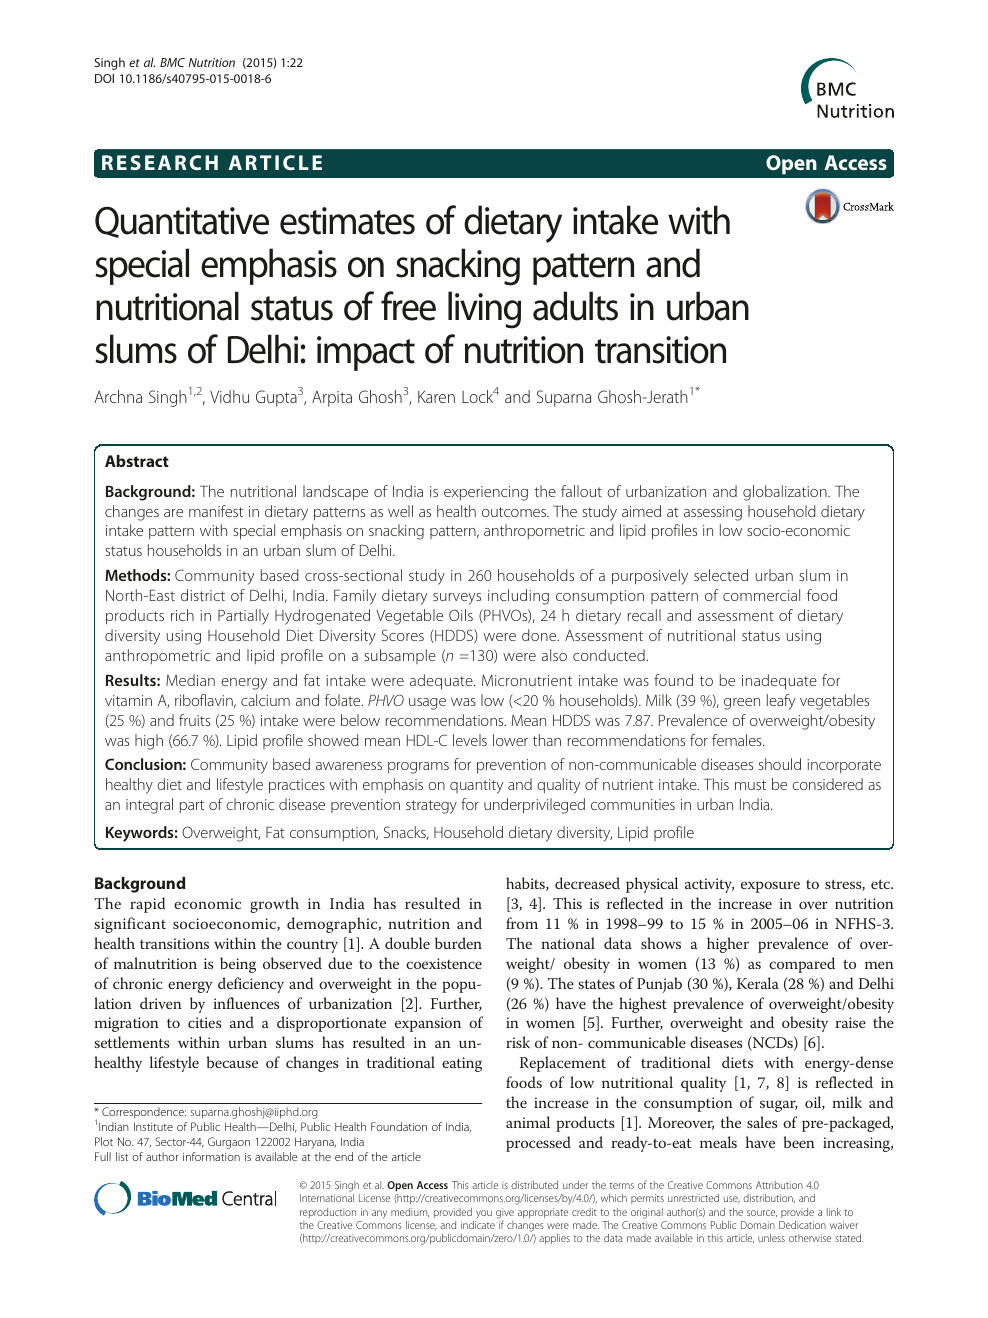 Quantitative estimates of dietary intake with special